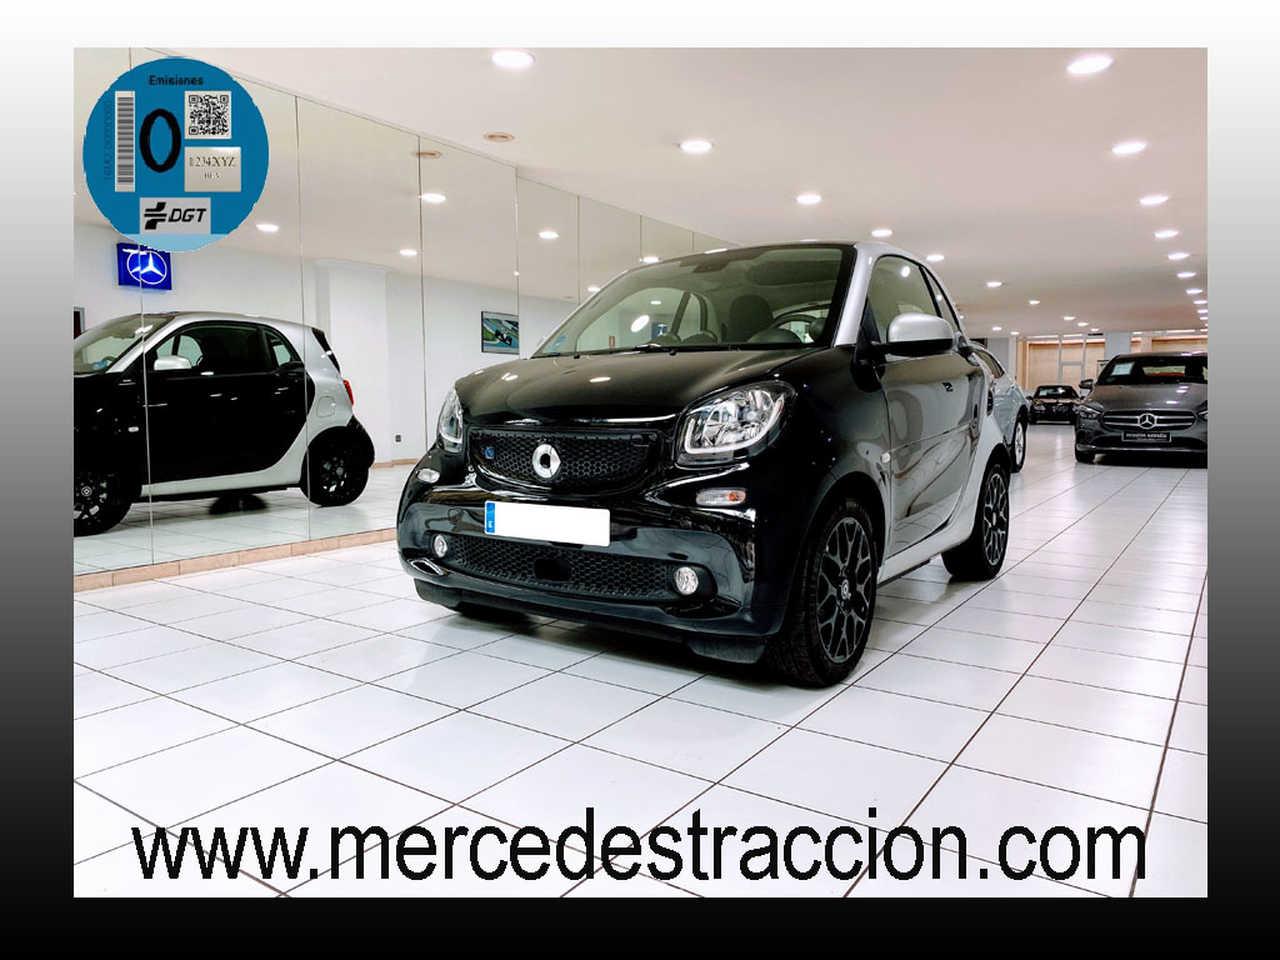 Smart Fortwo 81CV EQ Coupe/Passion/Paquete Deportivo 6.285 km   - Foto 1